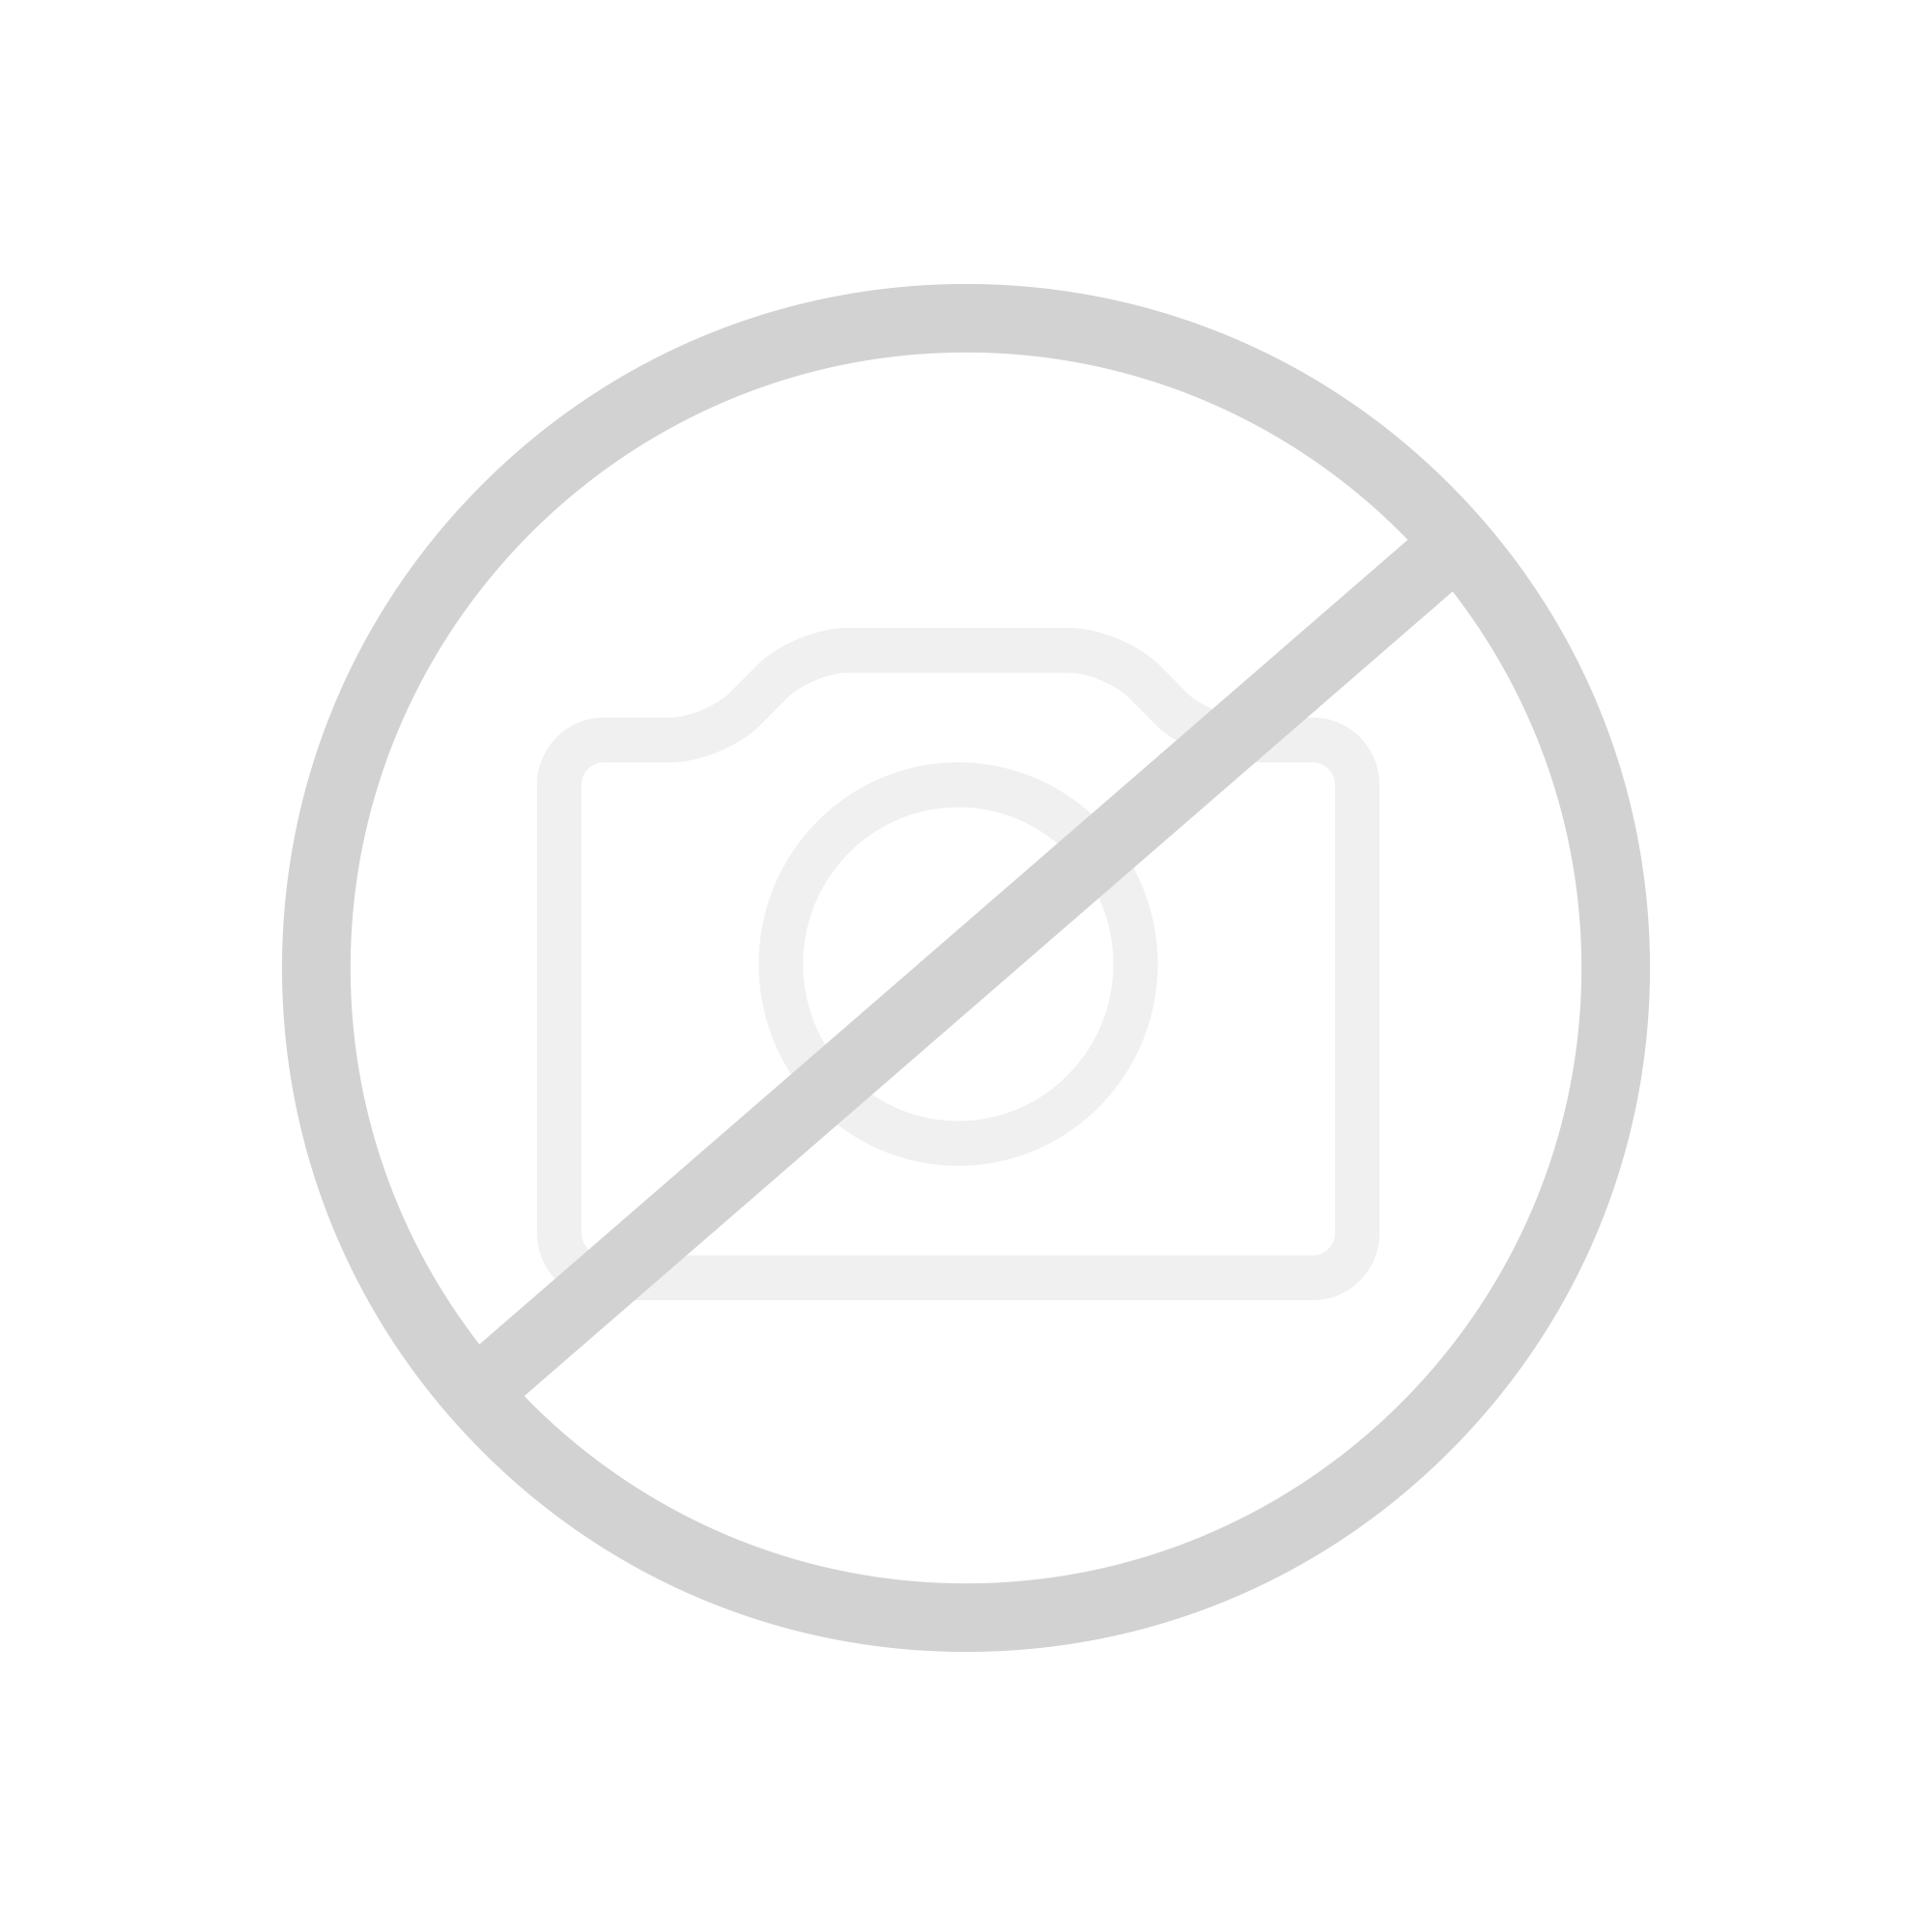 keramag icon tiefsp l kombination l 68 b 35 7 cm bodenstehend ohne sp lrand wei mit keratect. Black Bedroom Furniture Sets. Home Design Ideas